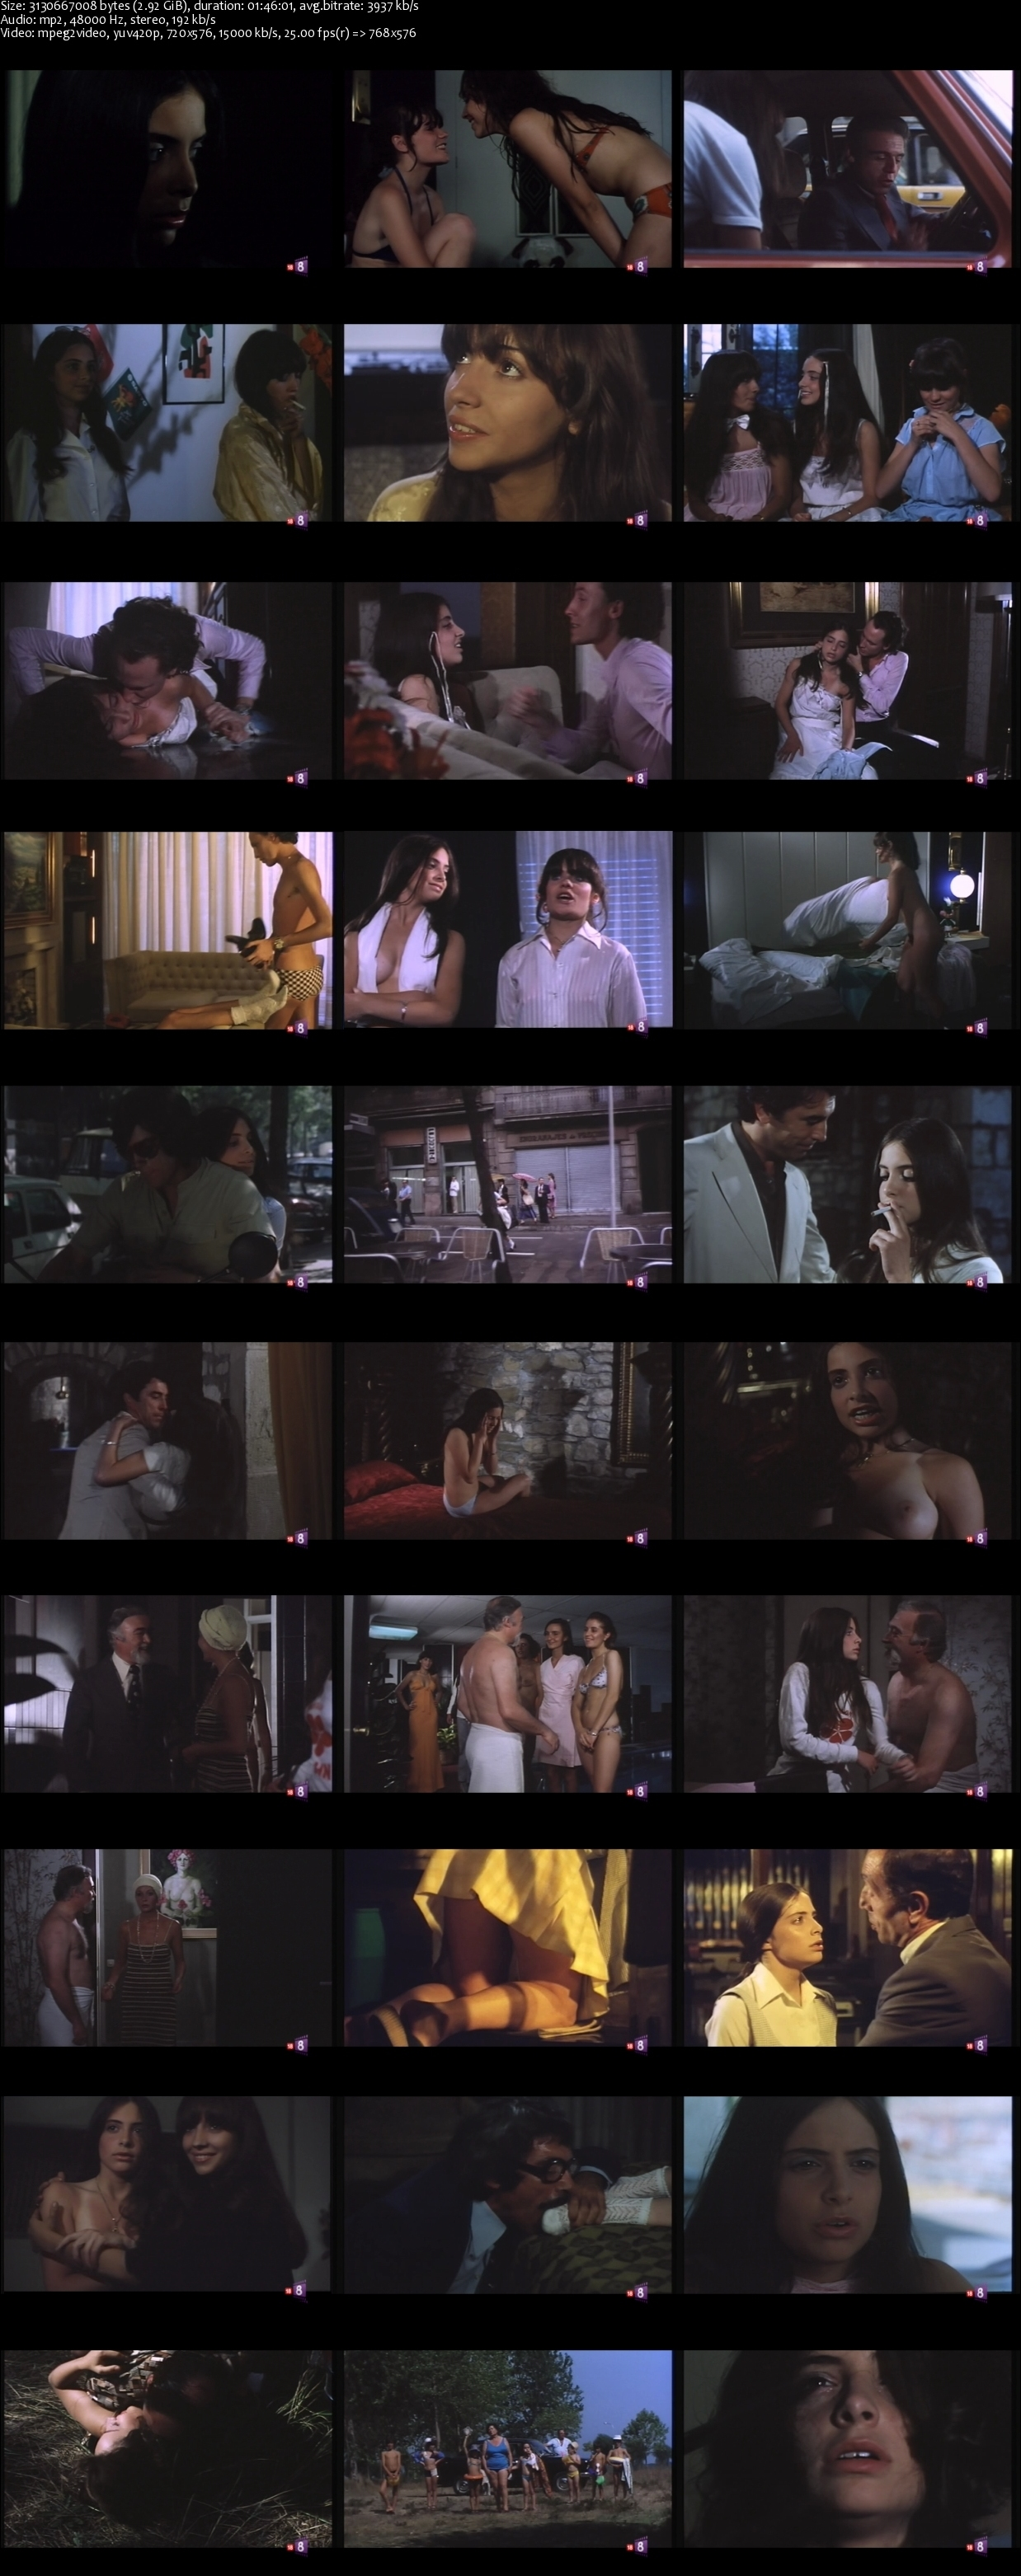 kamasutra-film-1996